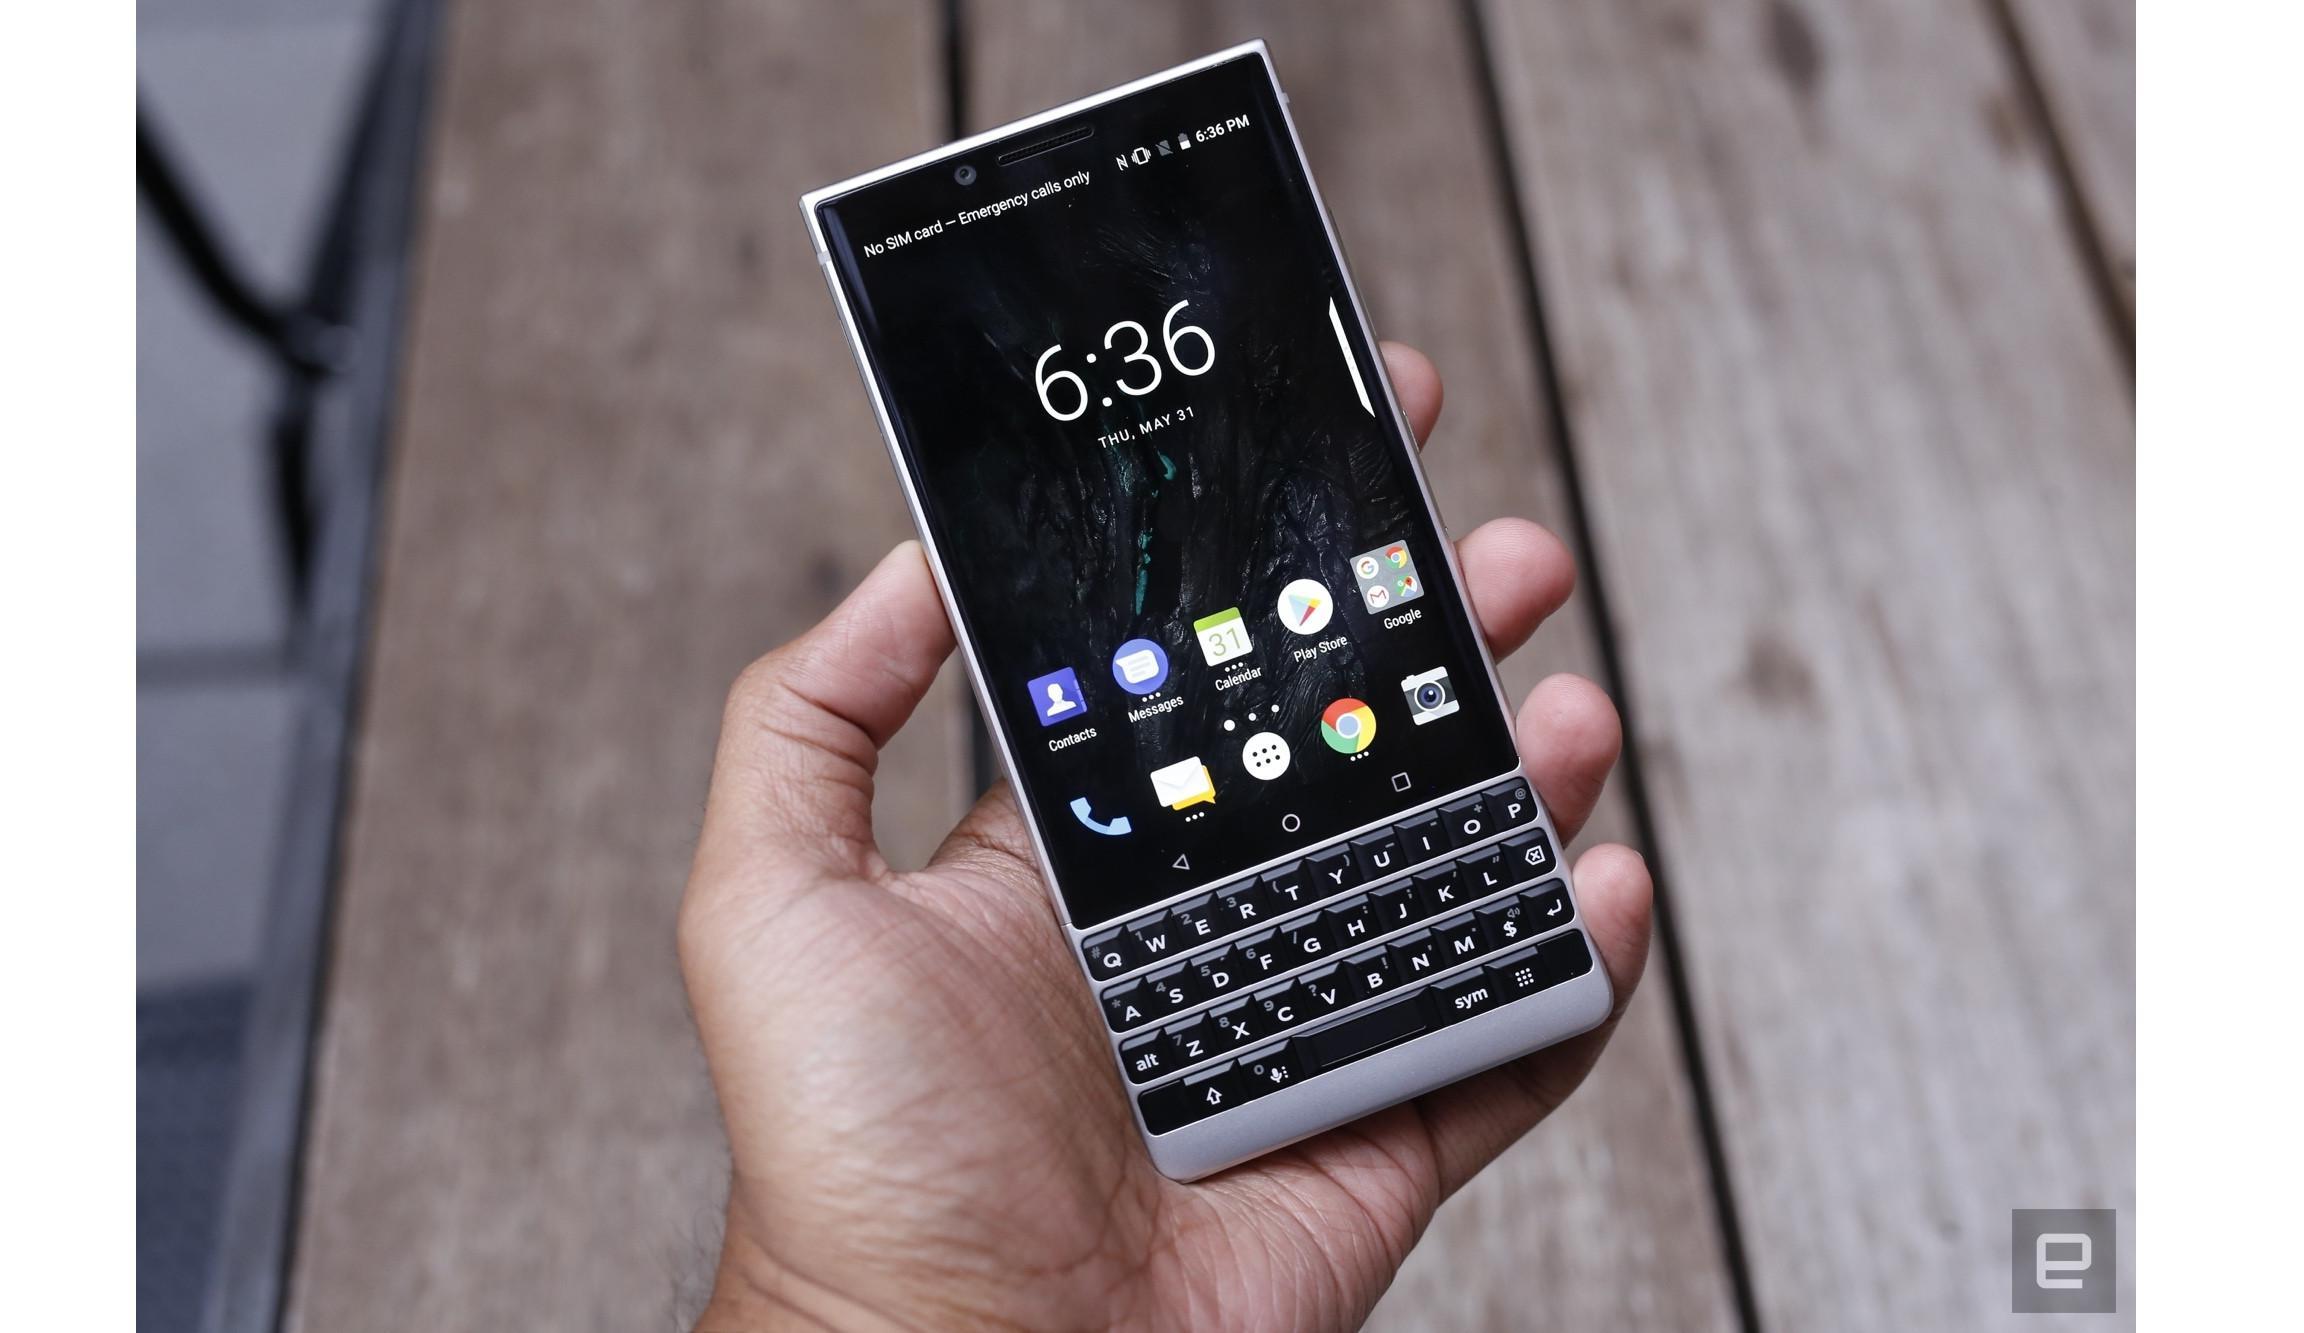 BlackBerry Key2 hadir dalam dua pilihan warna, yakni silver dan hitam (Foto: Engadget/ Chris Velazco)